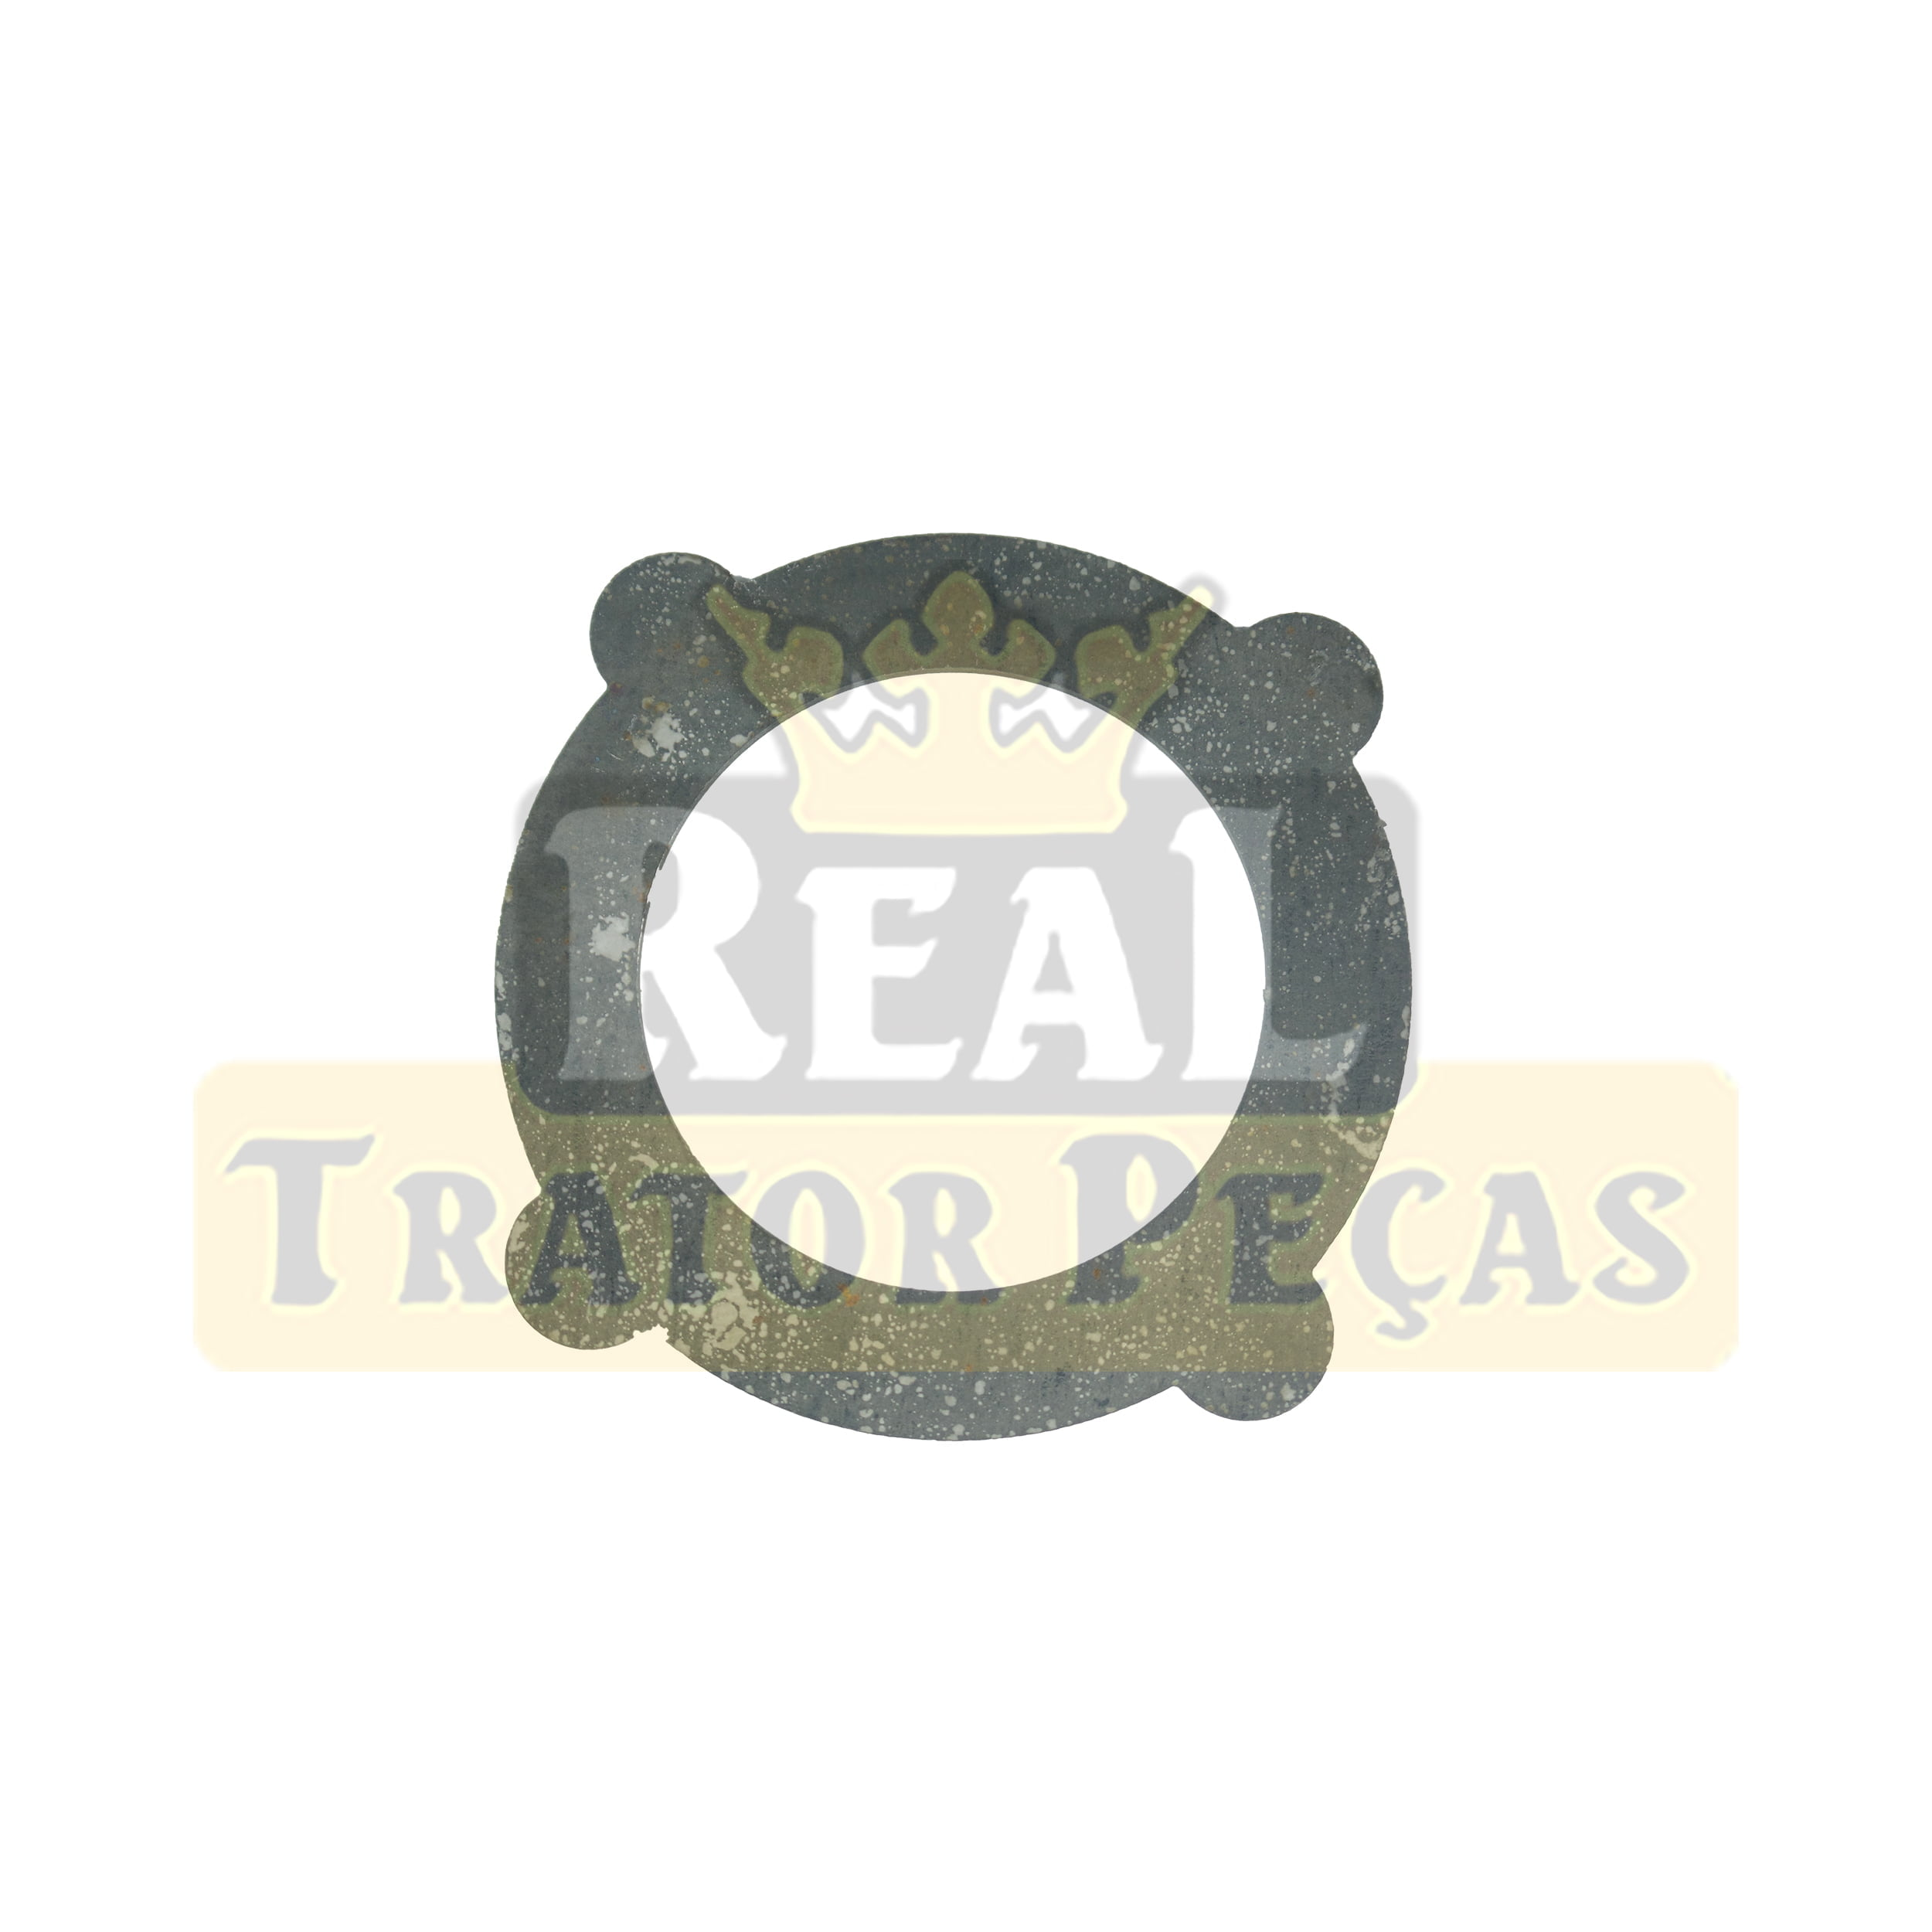 LAMELA EXTERNA DO DIFERENCIAL - APL 345 A 359 - MASSEY FERGUSON 290 A 299/610 A 680 | VALTRA 885 / 985 / 1180 A 1780 | BM85 A BM120 | NEW HOLLAND 7630 / 7830 / 8030 | JOHN DEERE 6300 / 6405 / 6600 / 6605 /7500 | AGRALE BX490/BX4110/BX4130/BX6110/BX6150